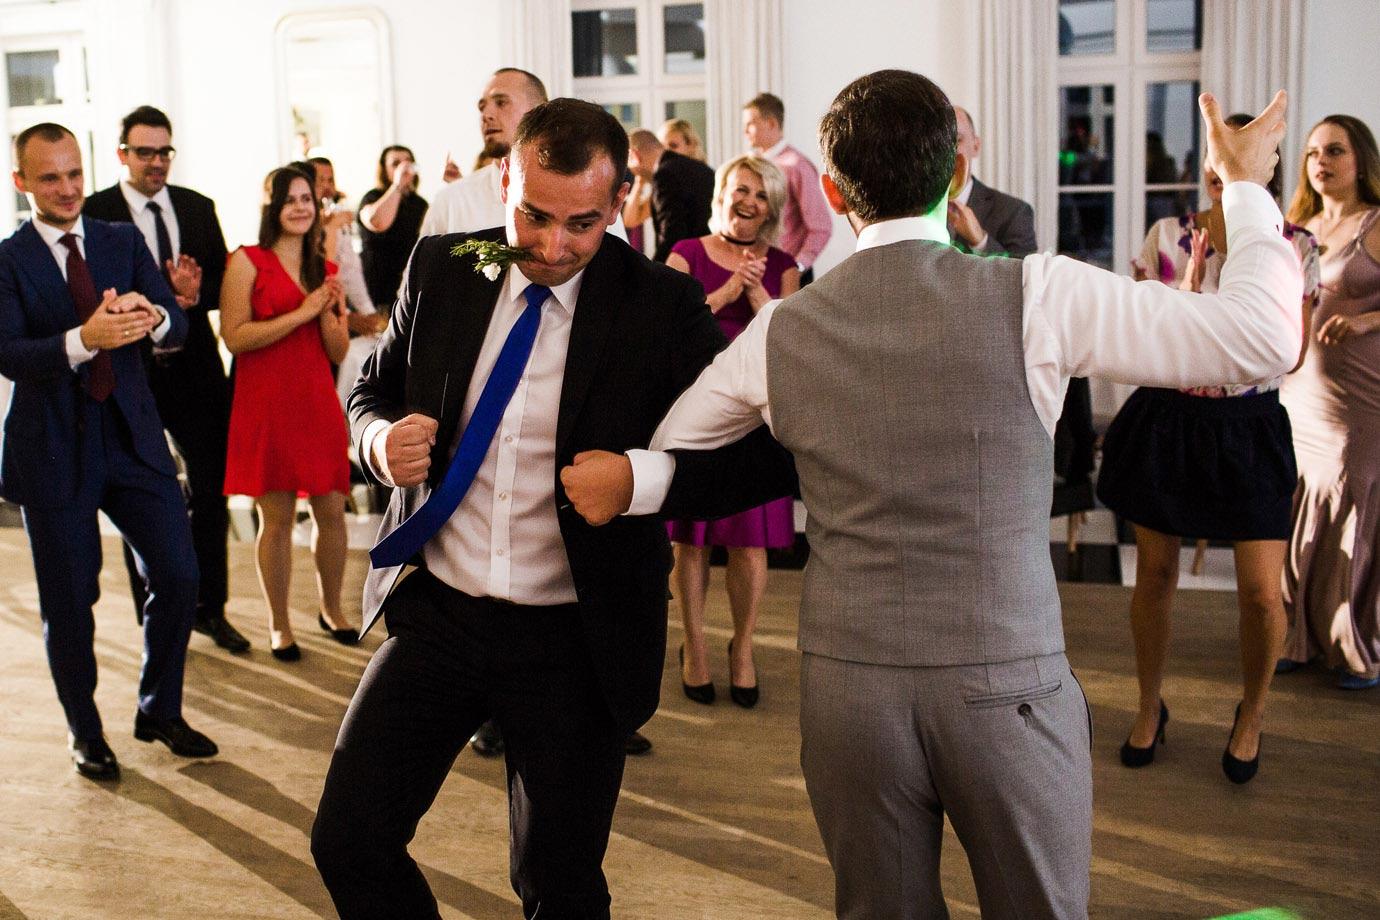 dobra impreza na weselu